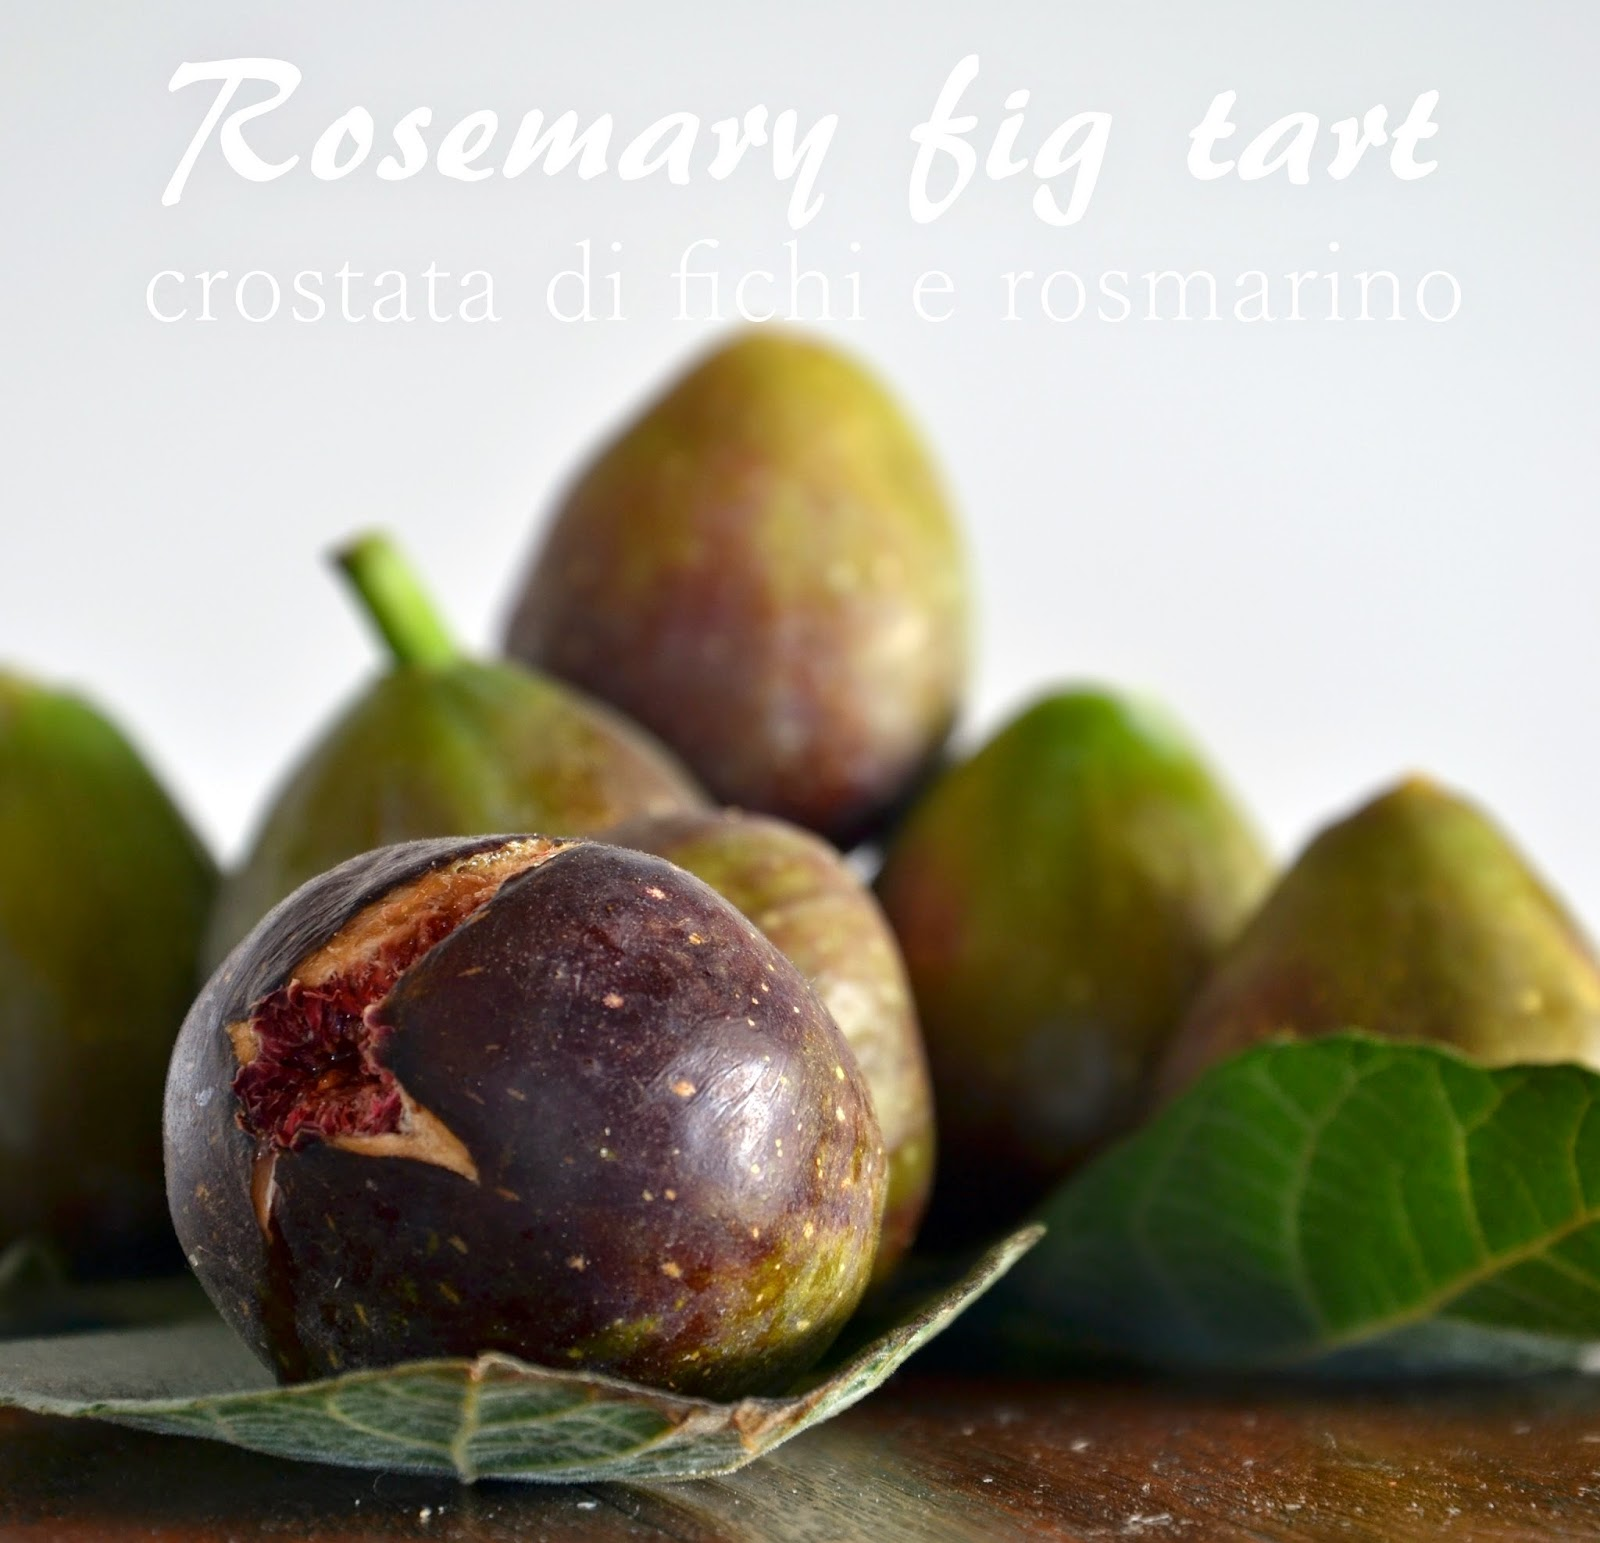 crostata di fichi e rosmarino - rosemary fig tart